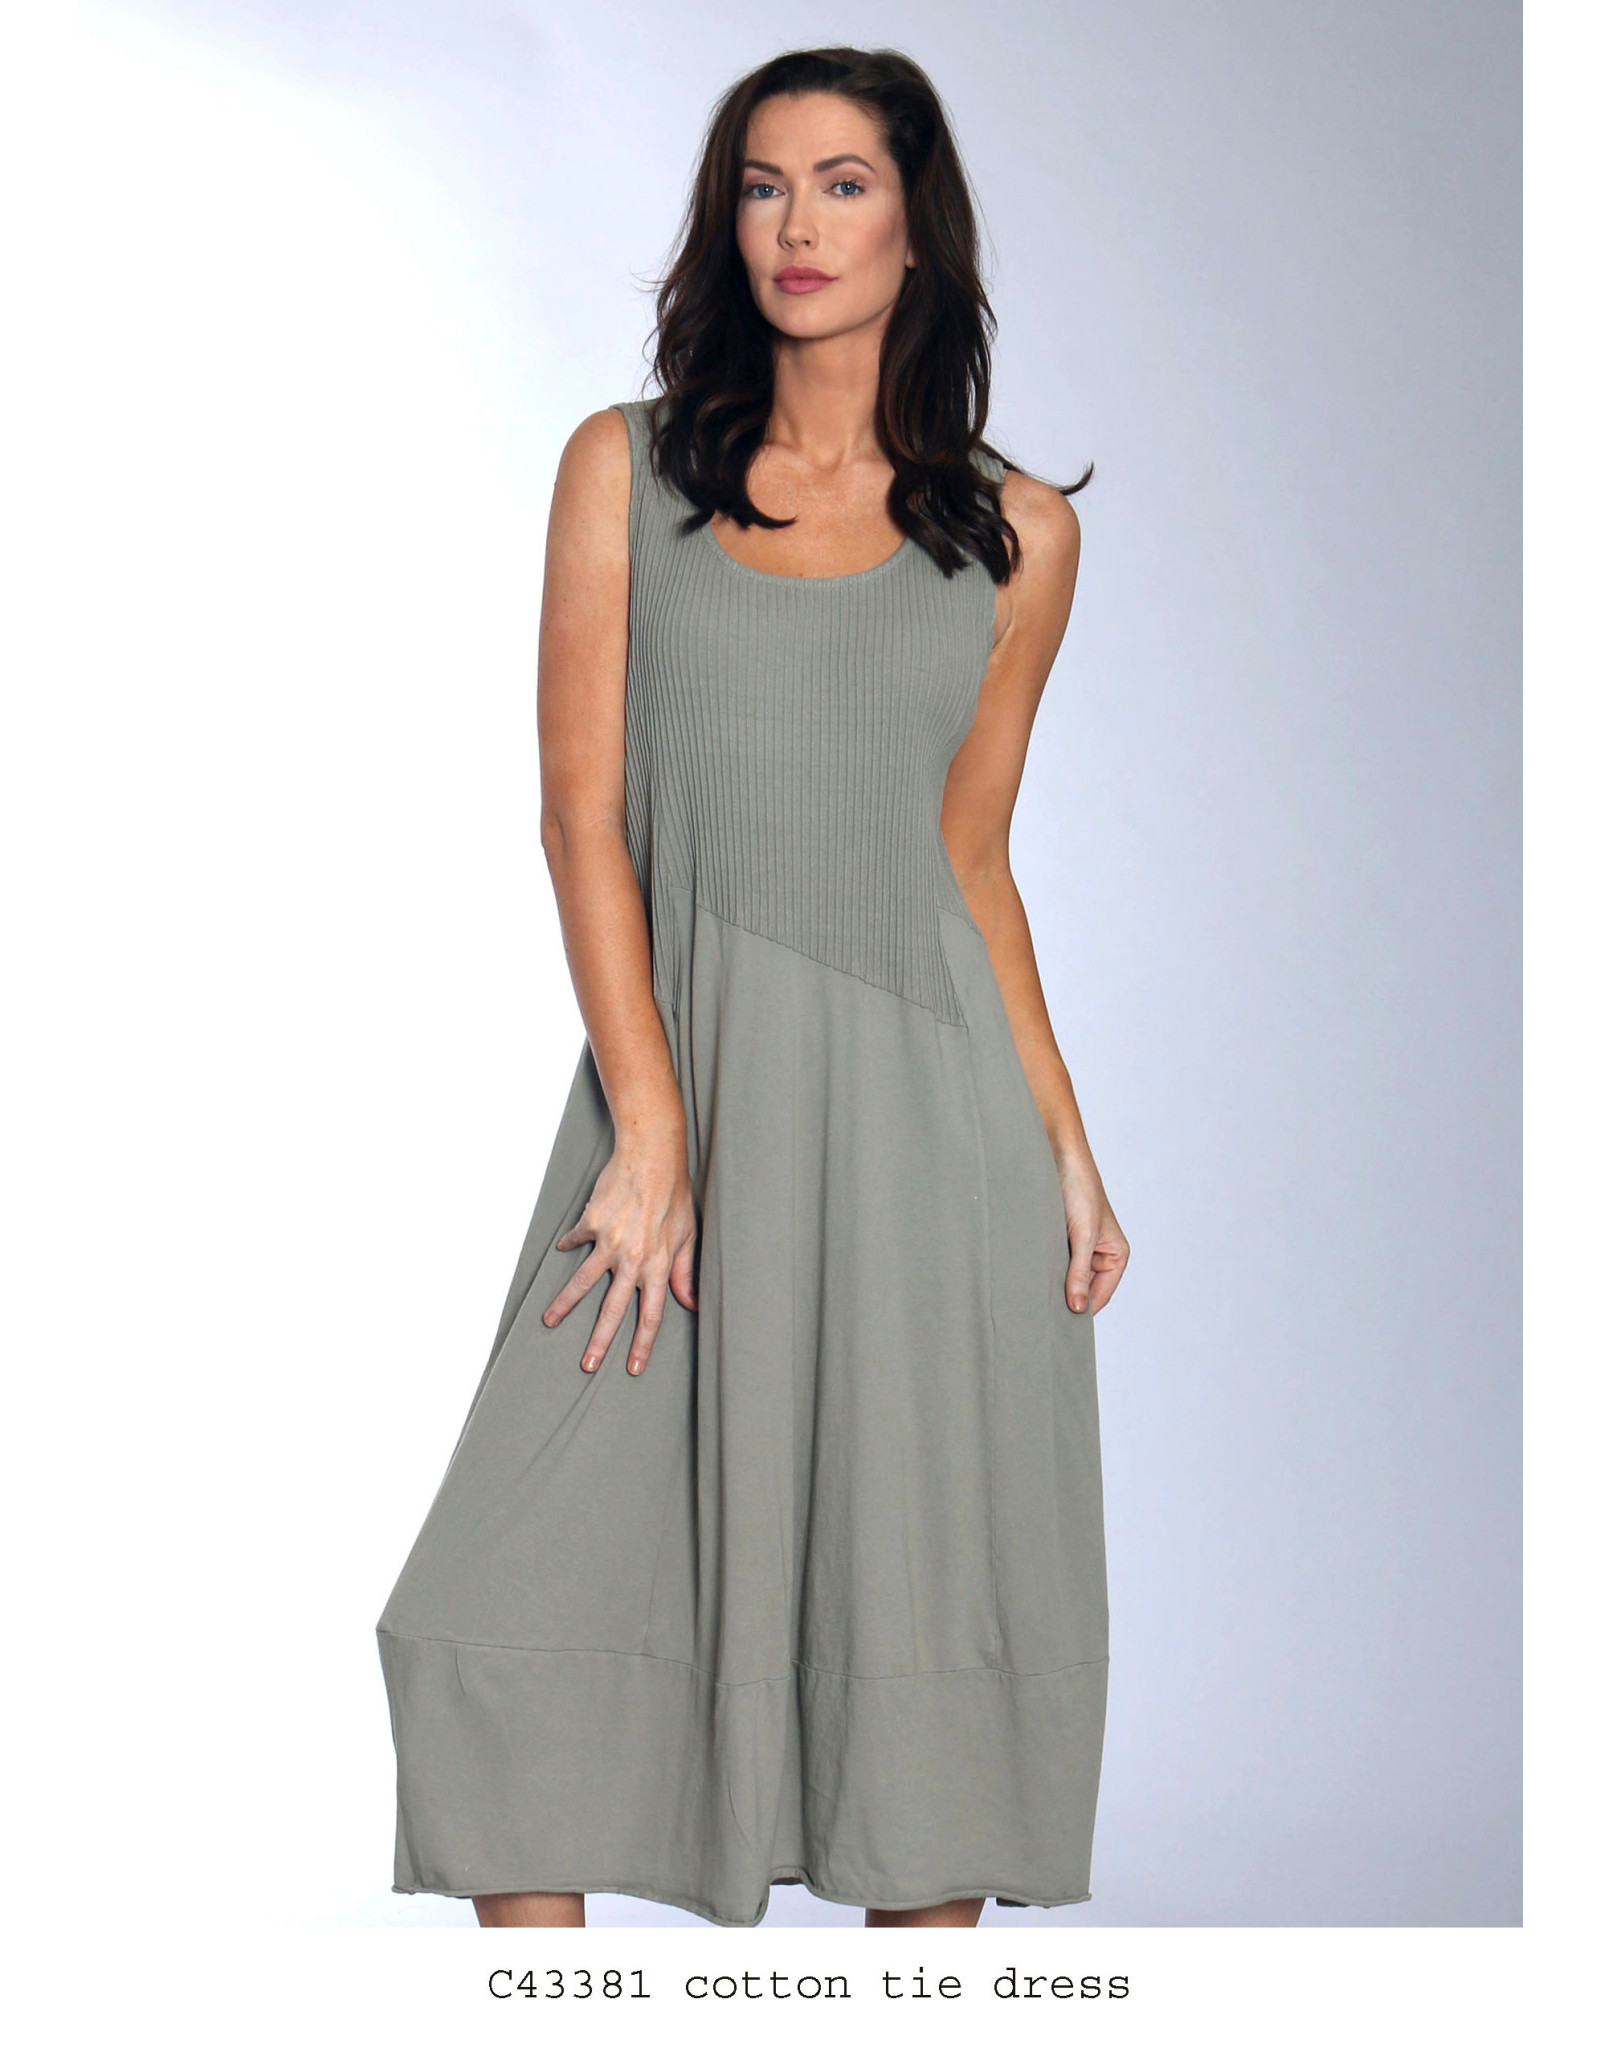 Fenini Tie Dress